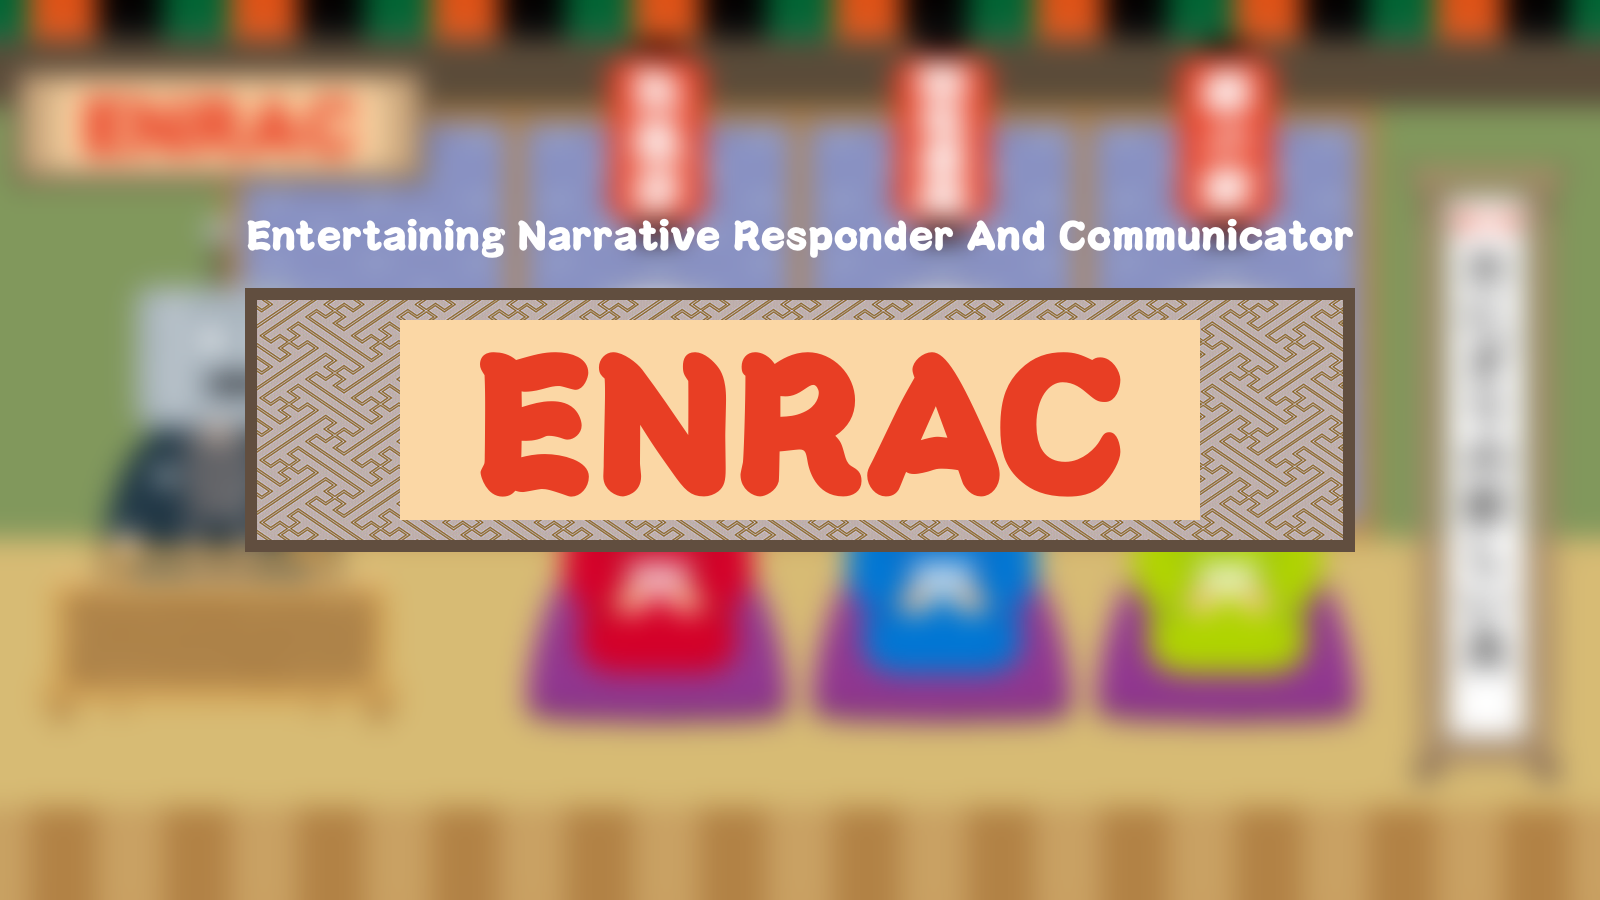 ENRAC